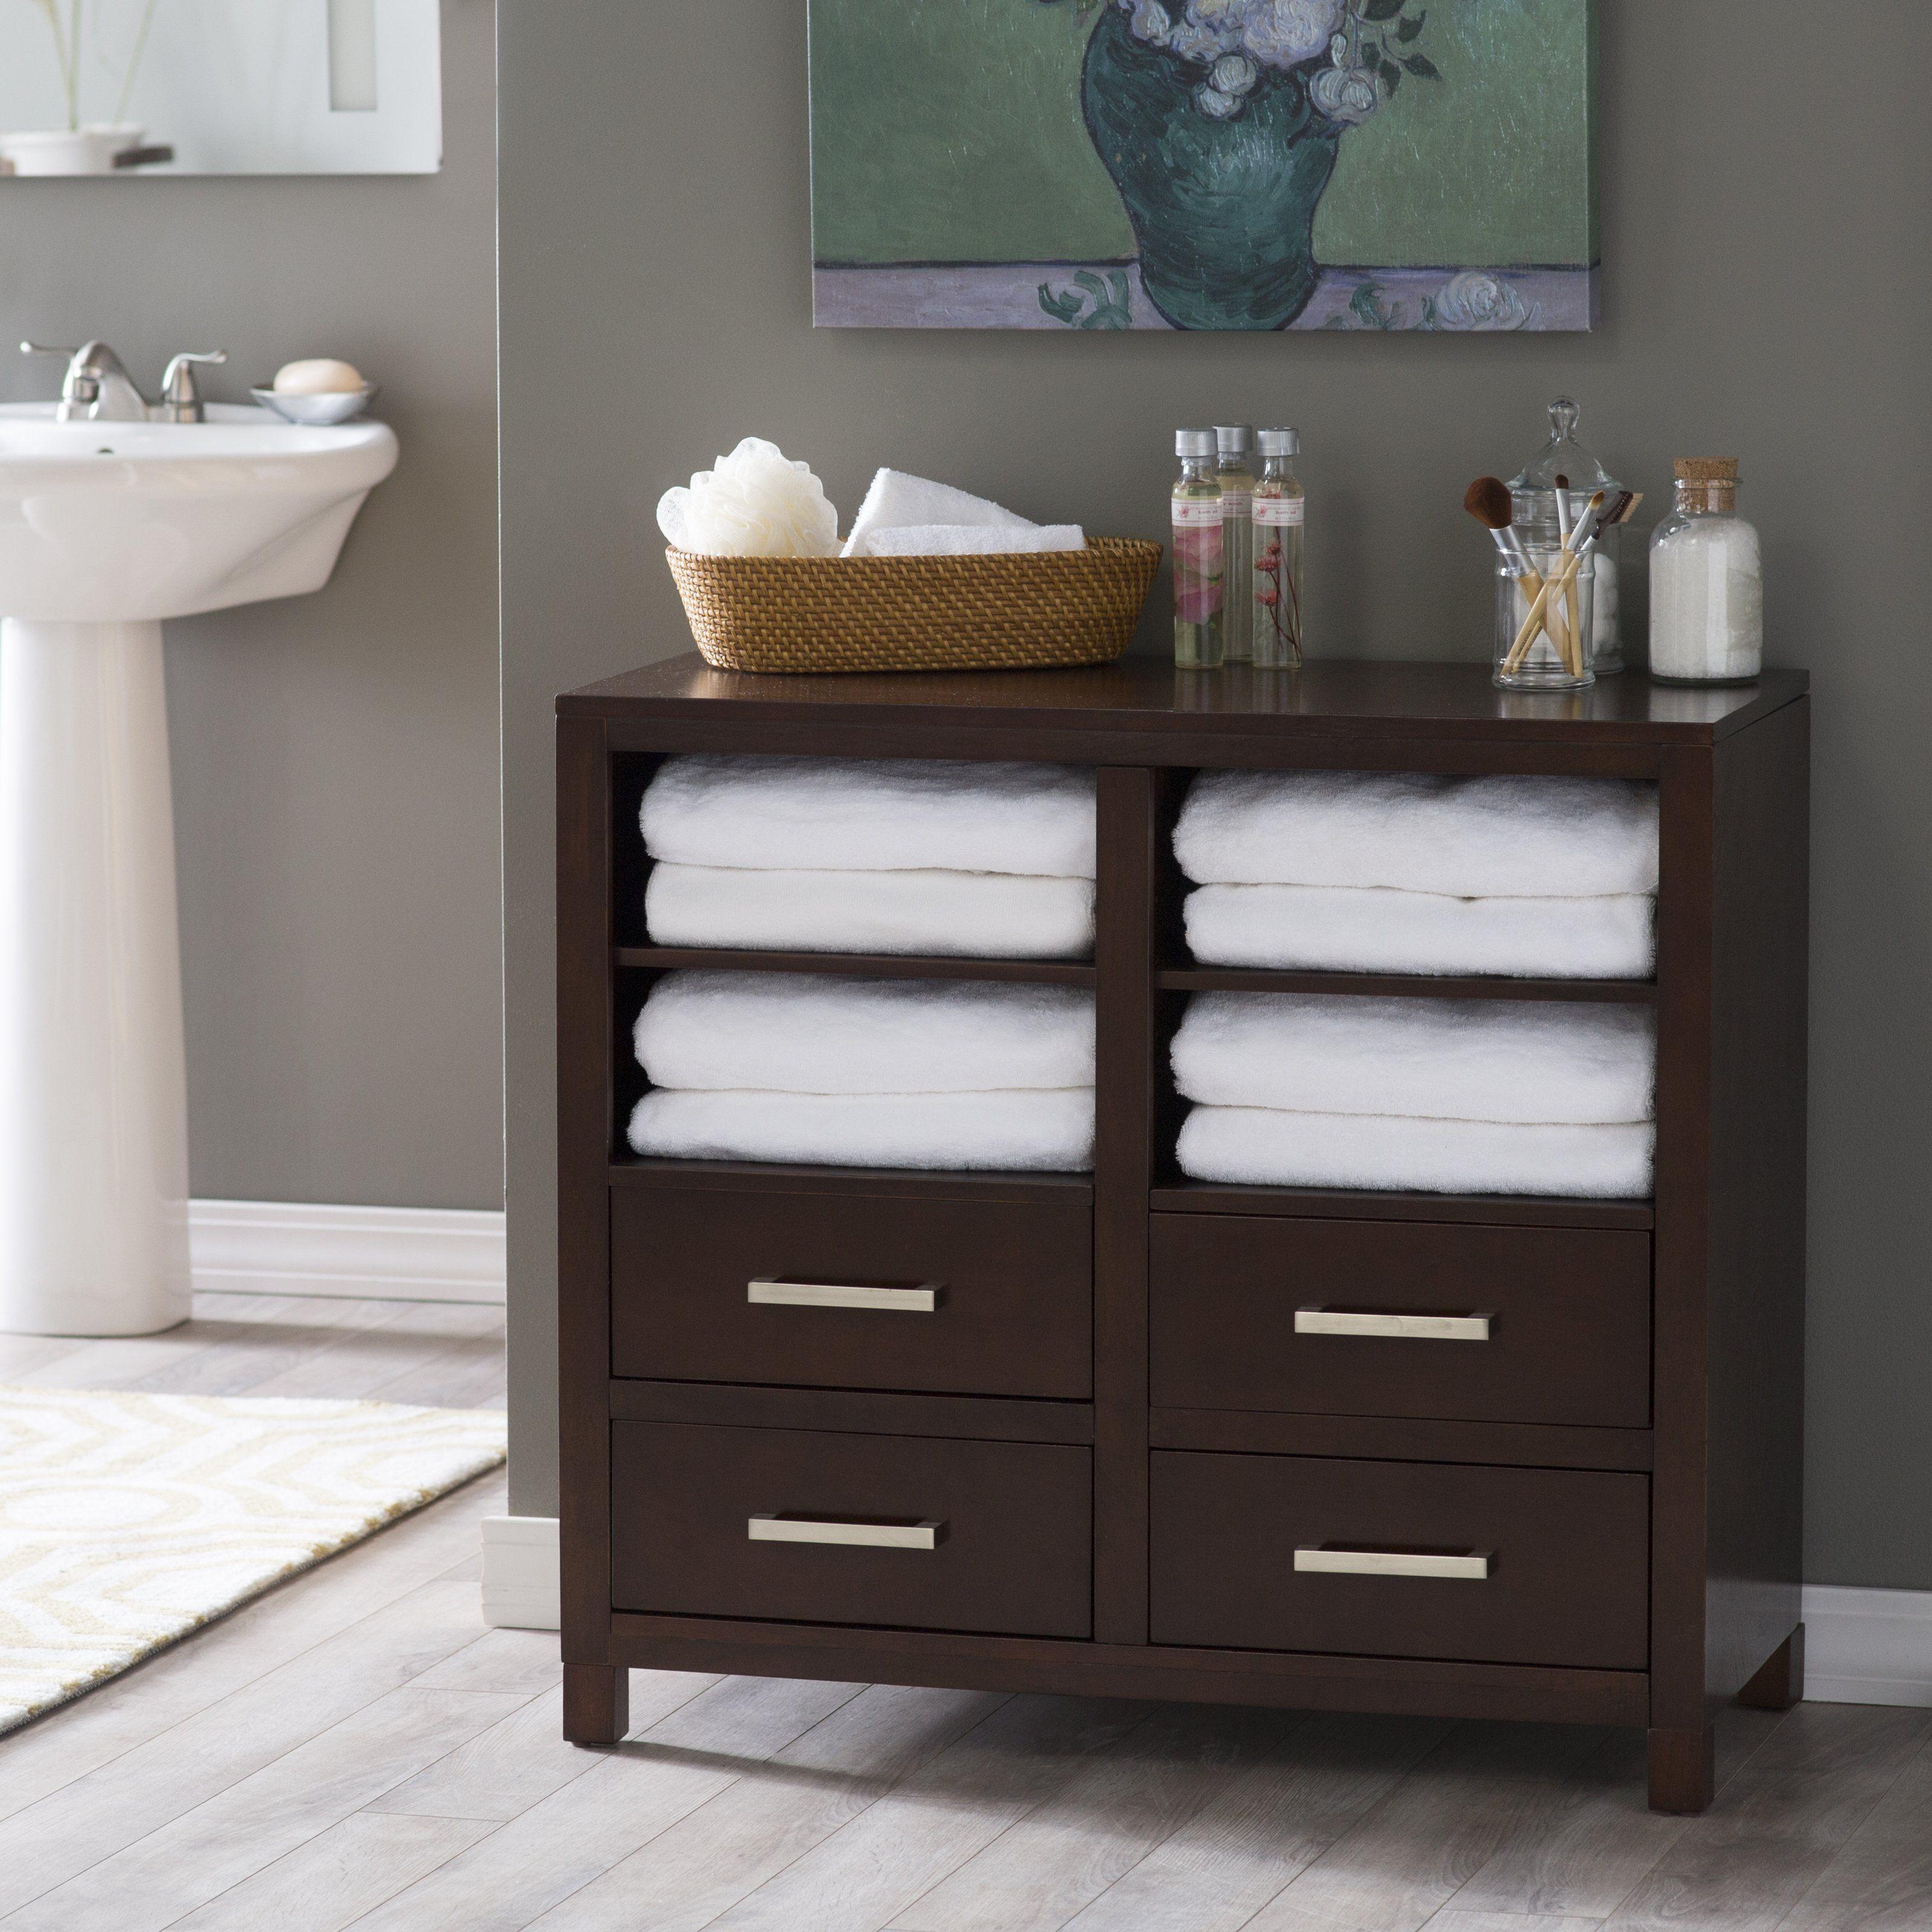 Fantastic Bathroom Floor Cabinet Dcor Bathroom Design Ideas regarding measurements 3200 X 3200